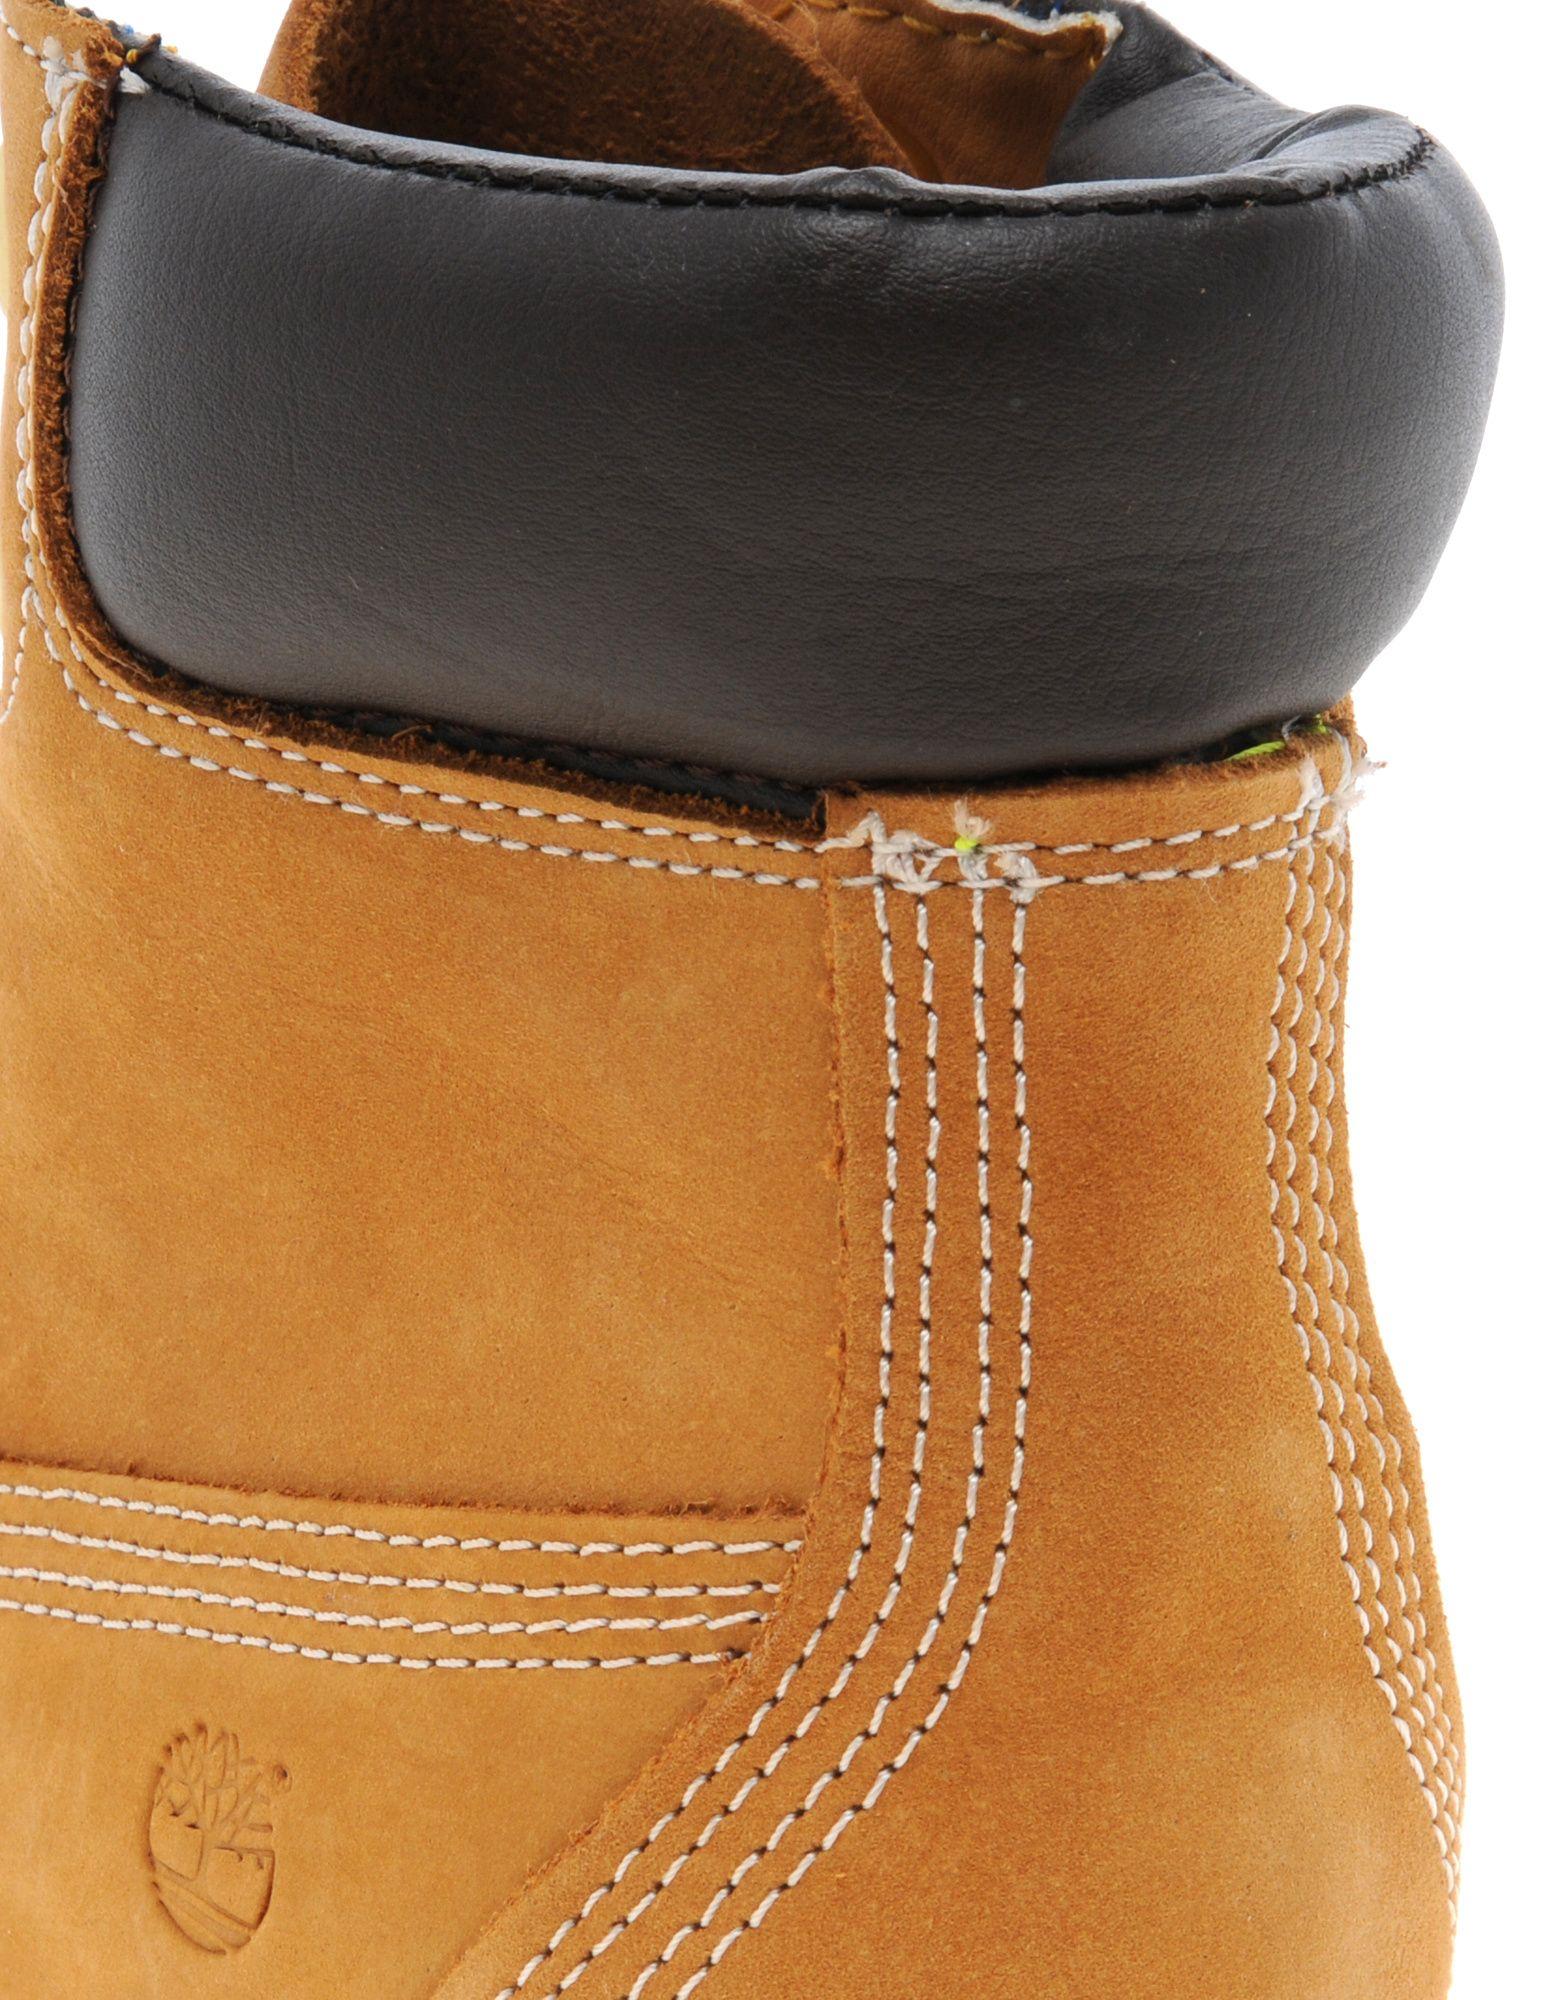 Timberland 6 Inch Glastenbury Cupsole Boots Women's